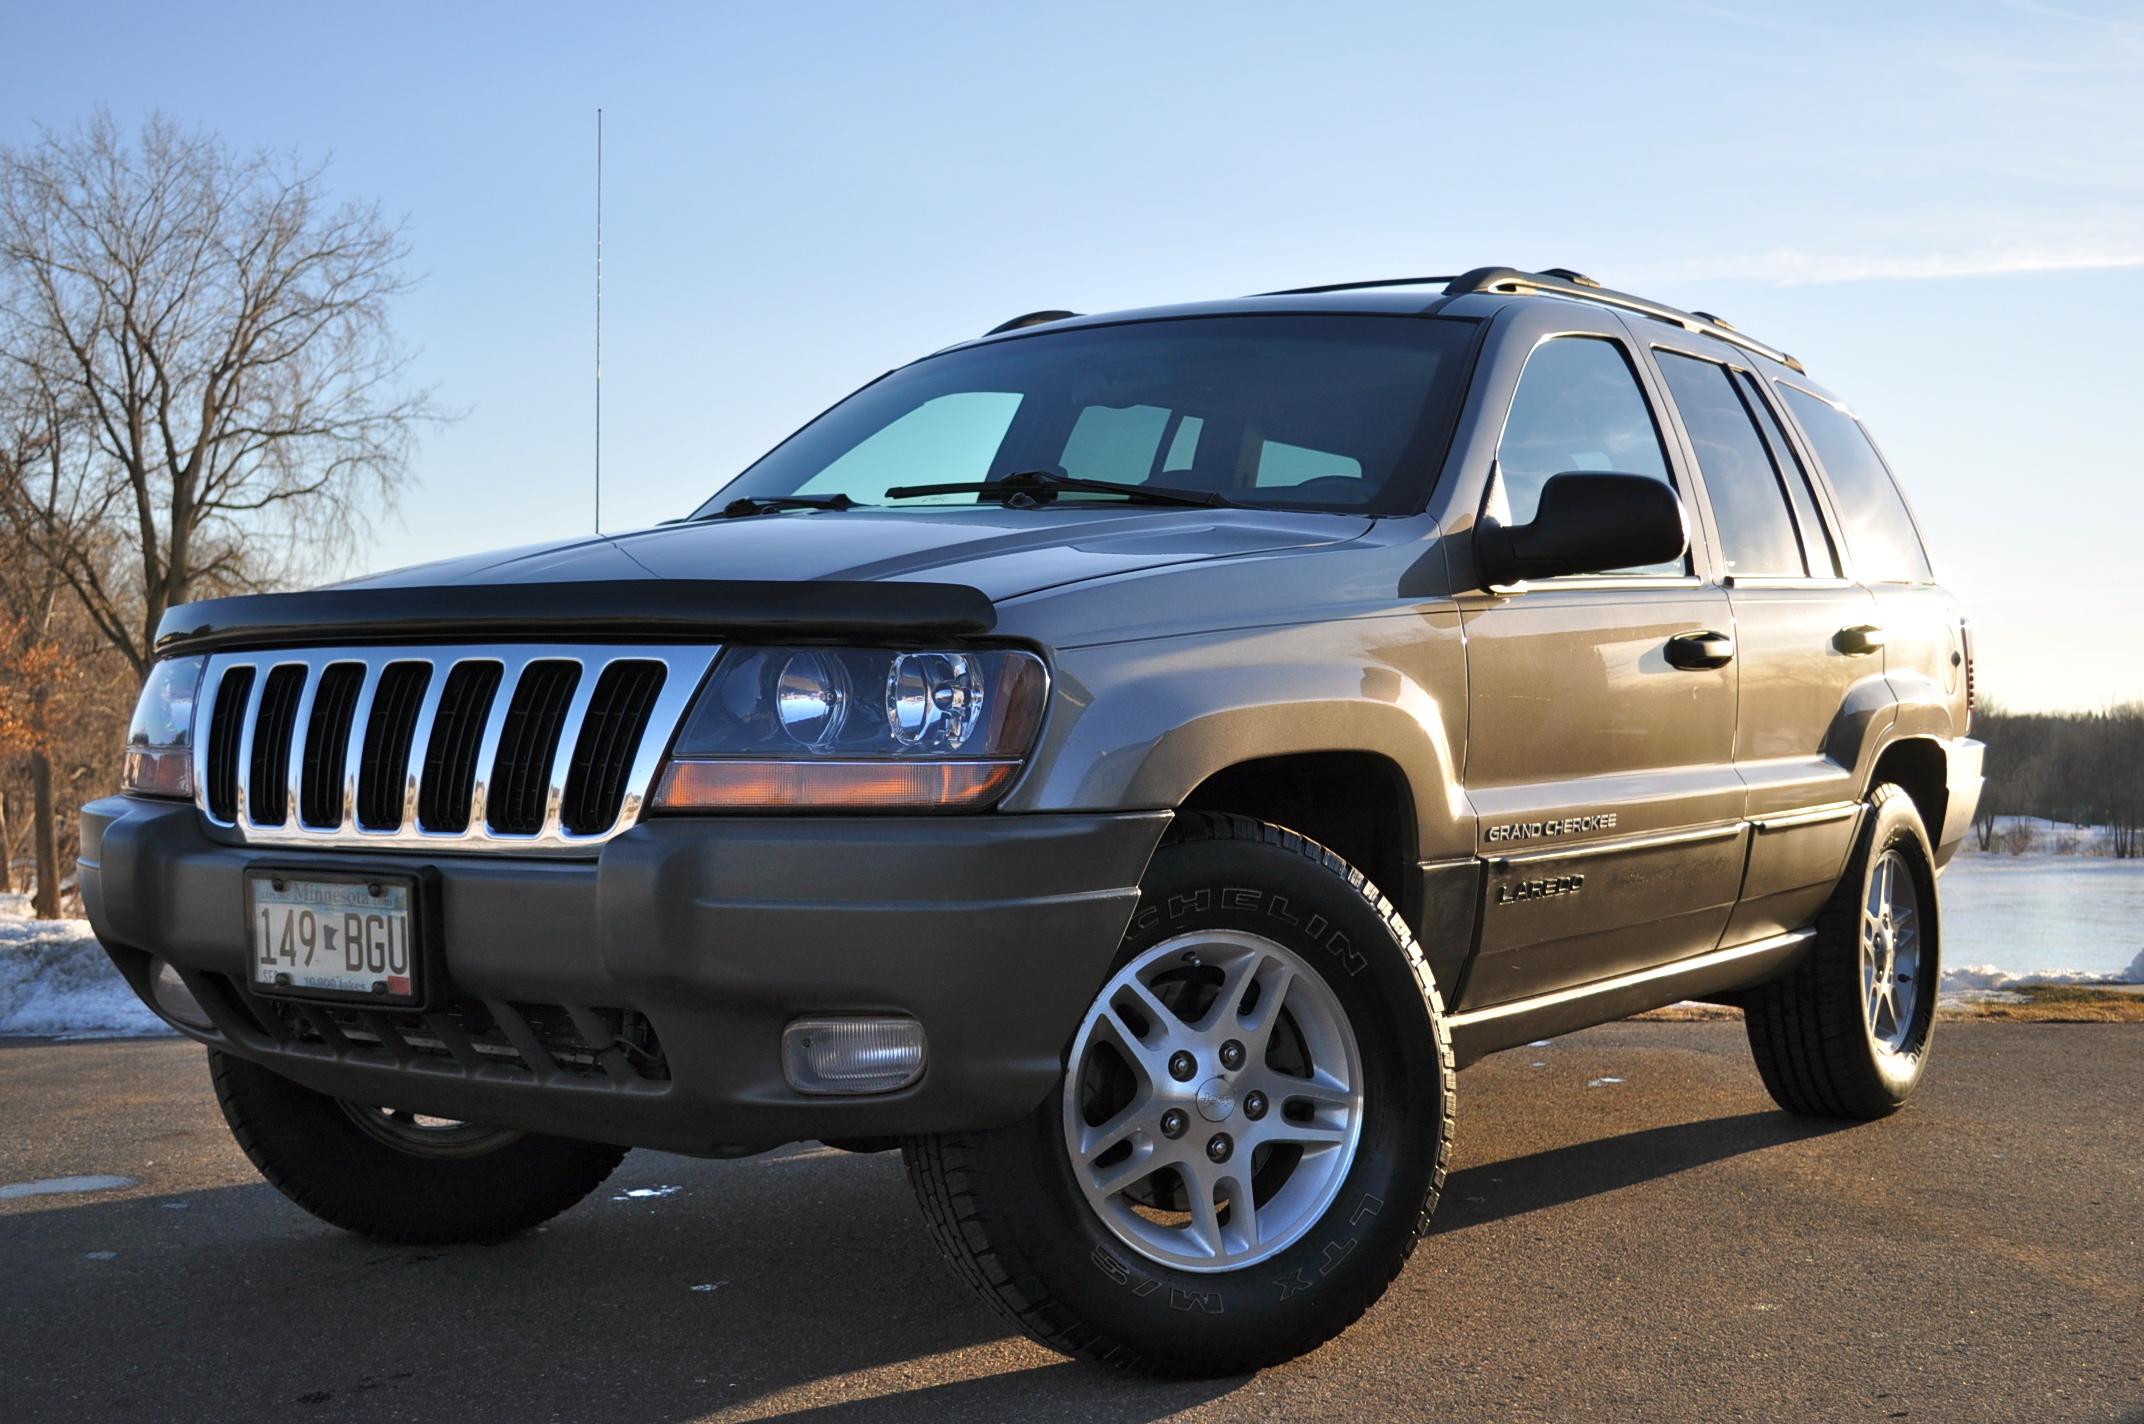 1999 jeep grand cherokee 8 jeep grand cherokee 8